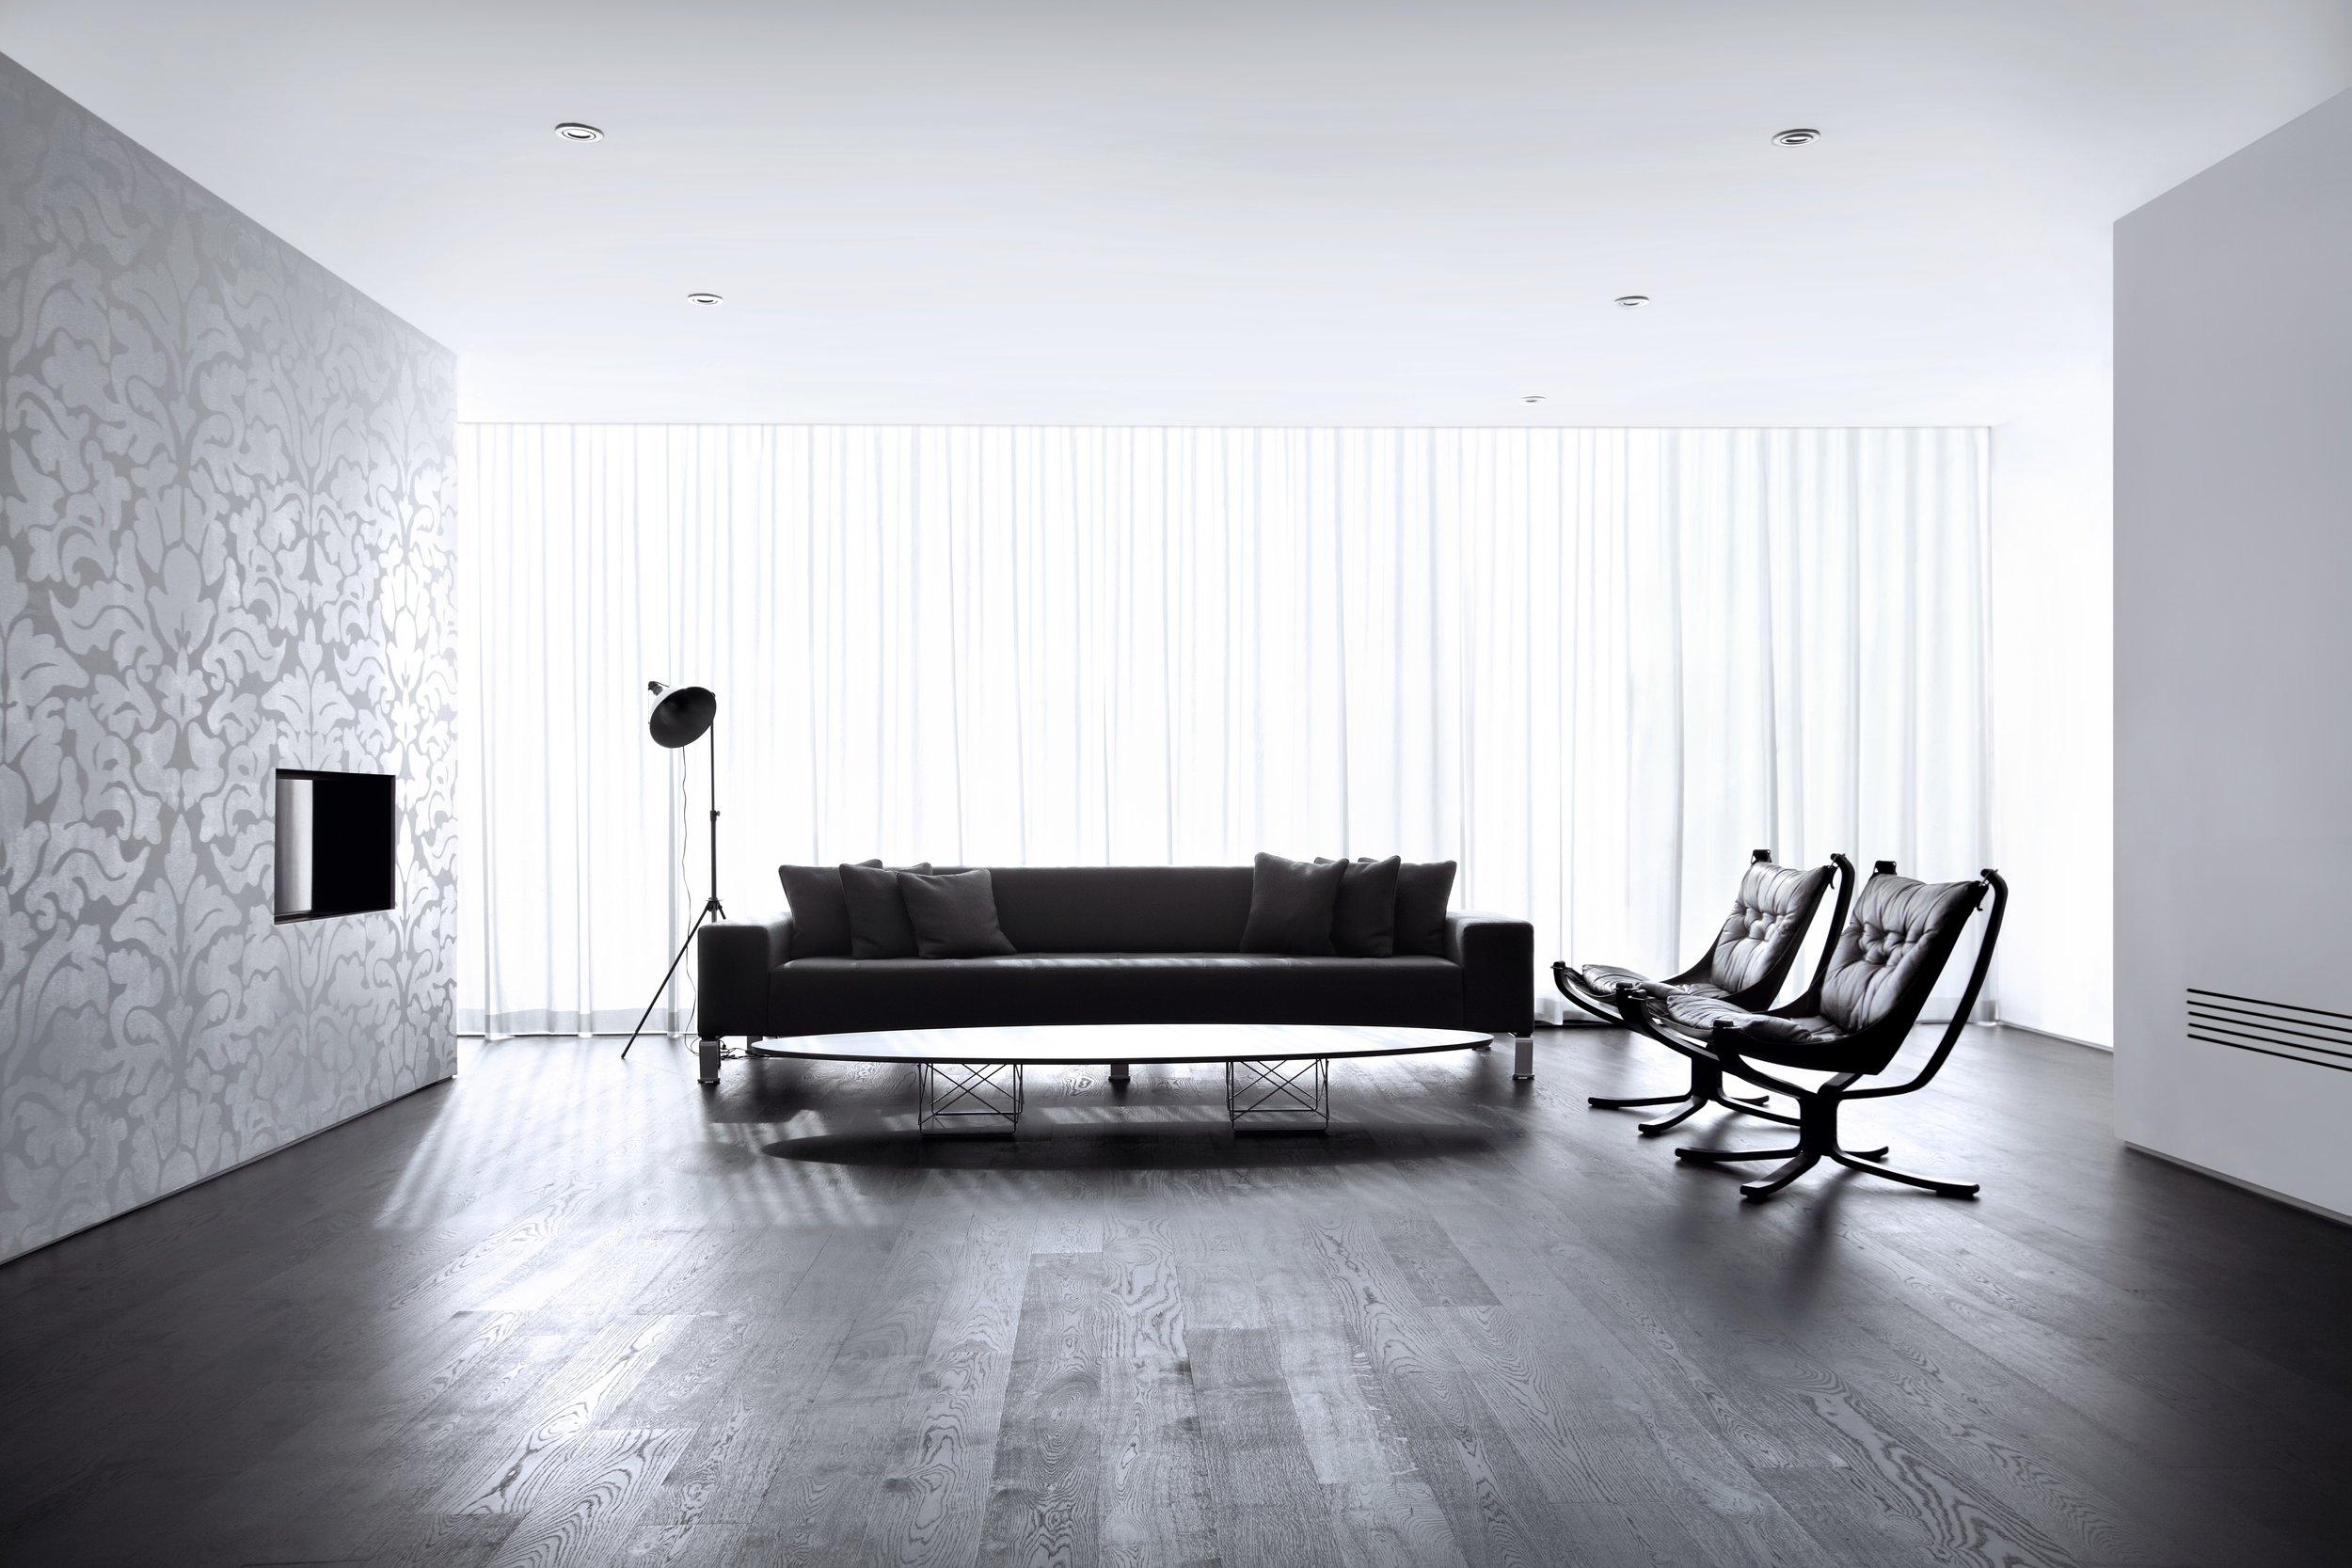 House 60 - living room patterned wall black floor